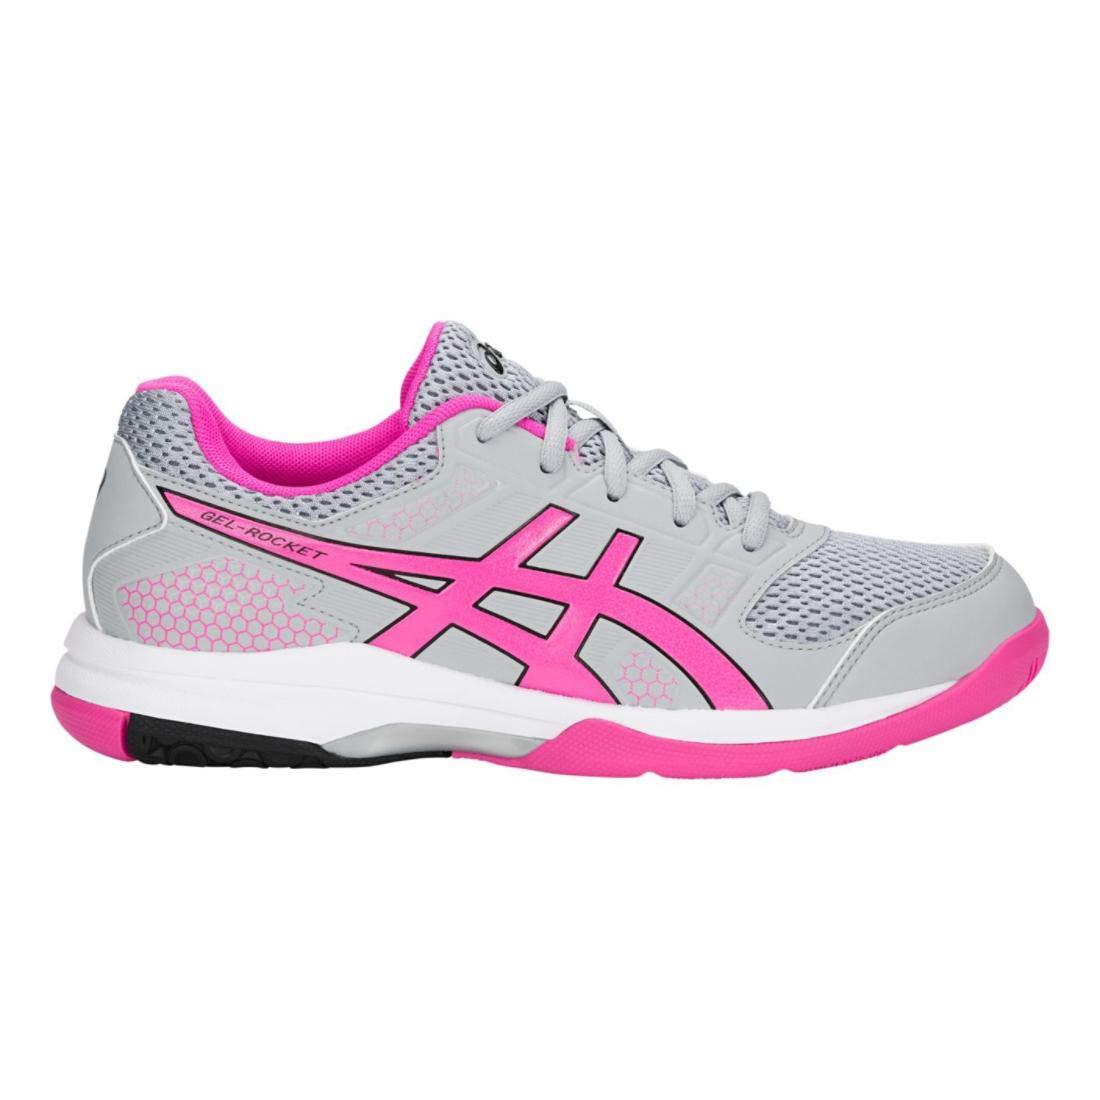 ASICS - Frauen Gel-Rocket® 8 Schuhe